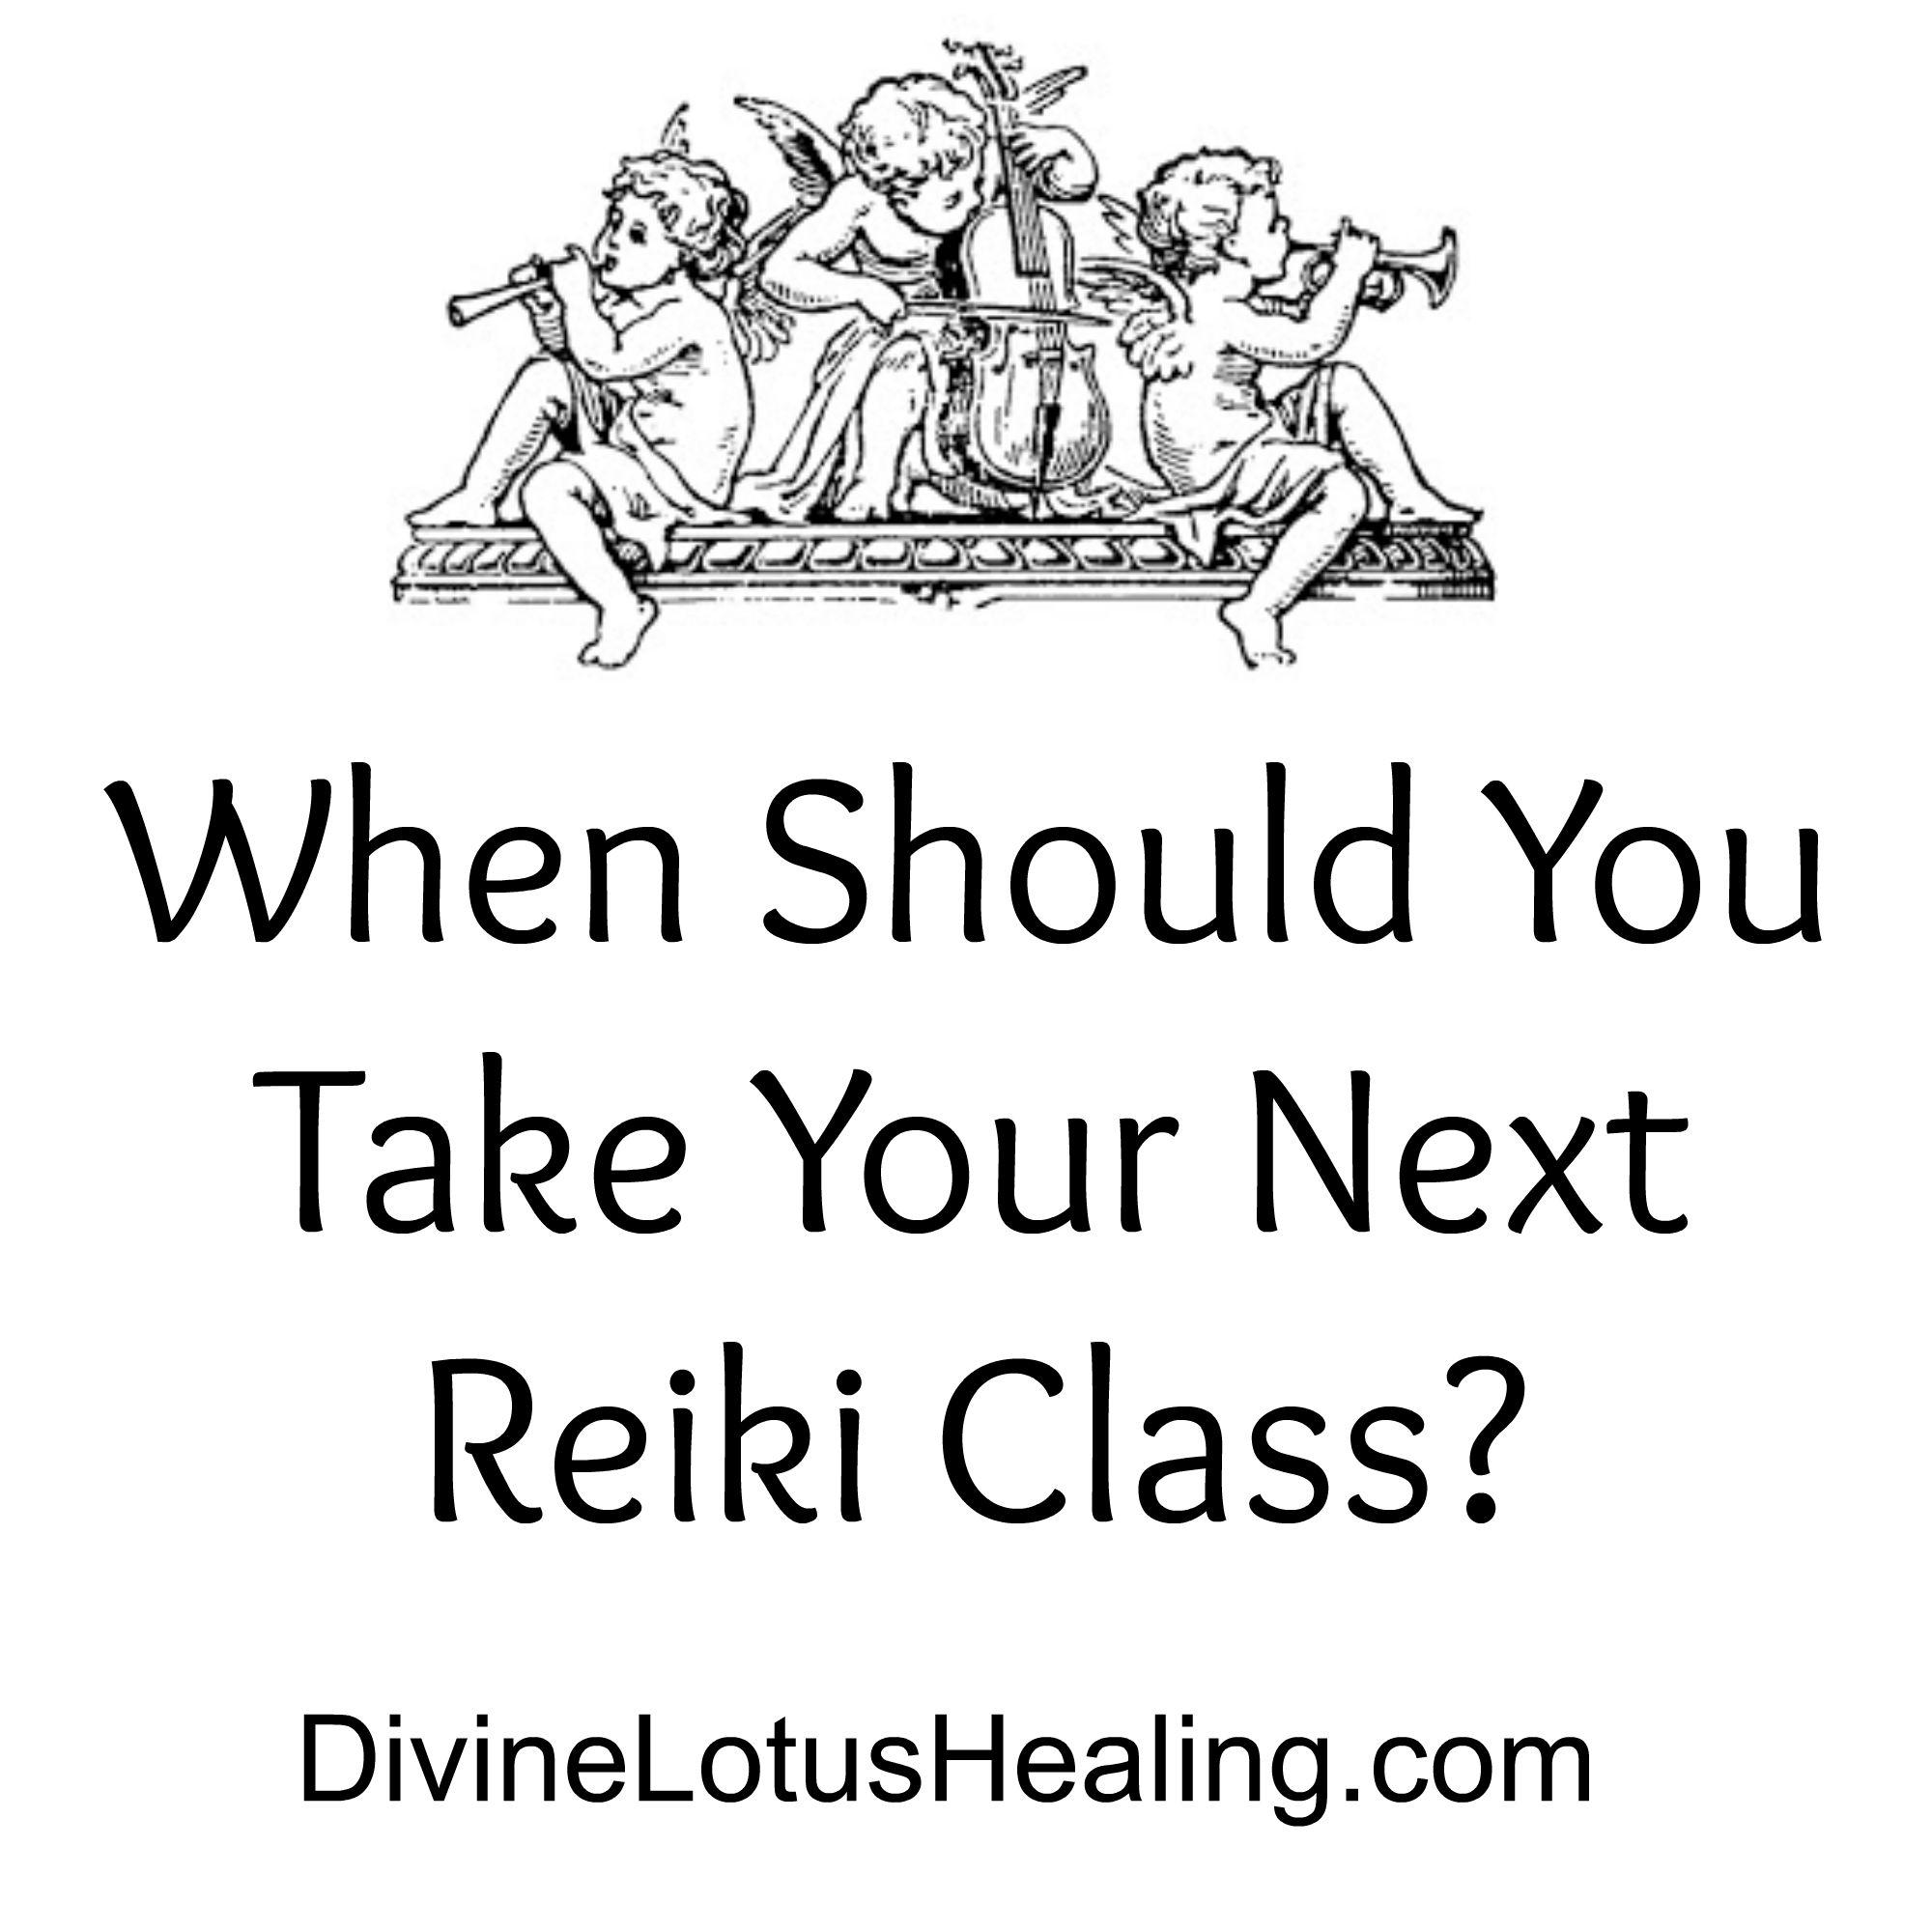 When Should You Take Your Next Reiki Class